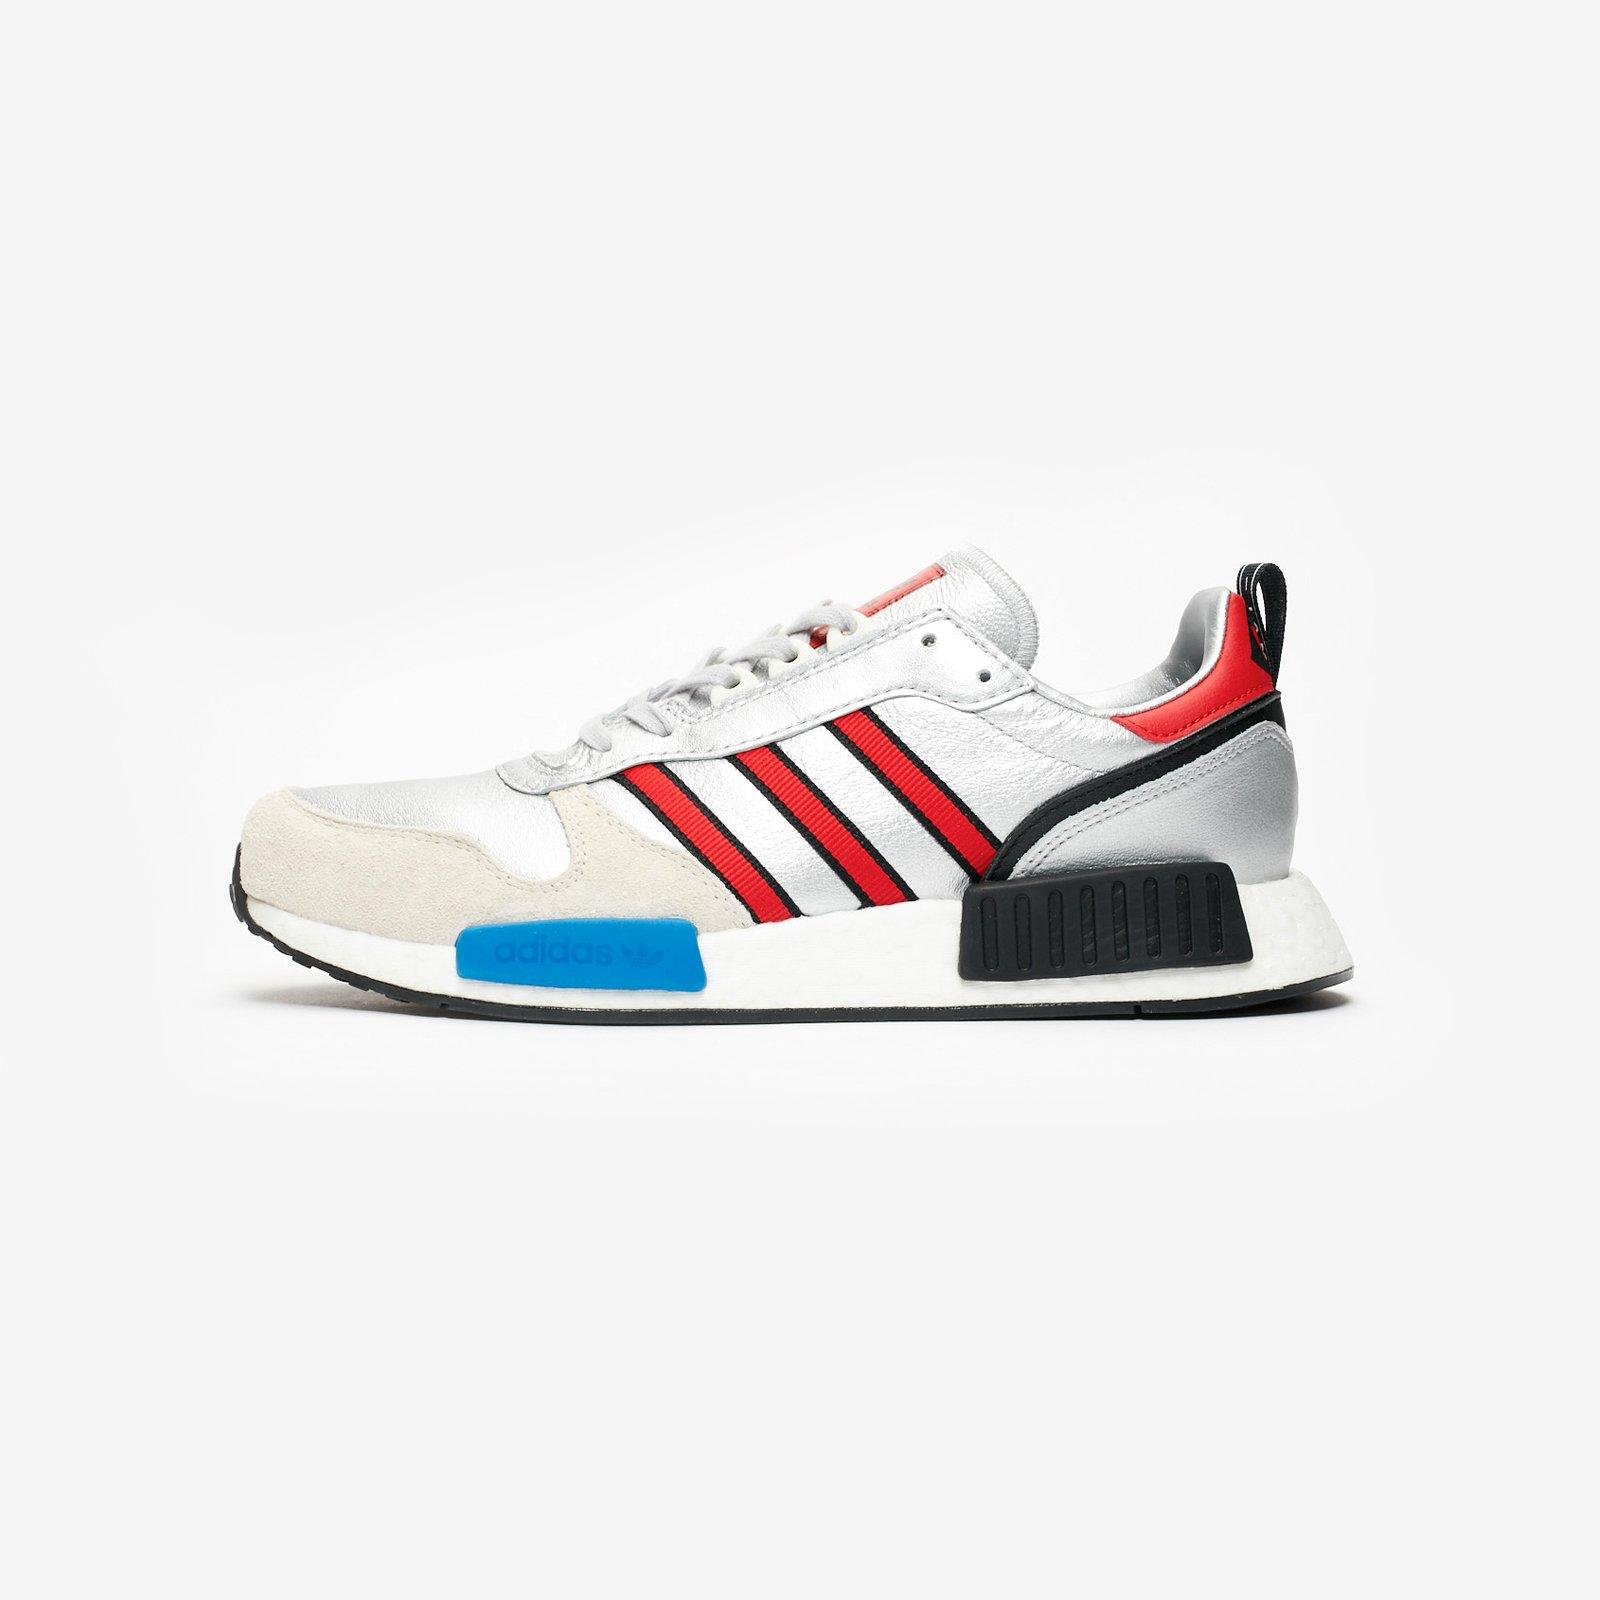 adidas Rising Star x R1 G26777 Sneakersnstuff I Sneakers